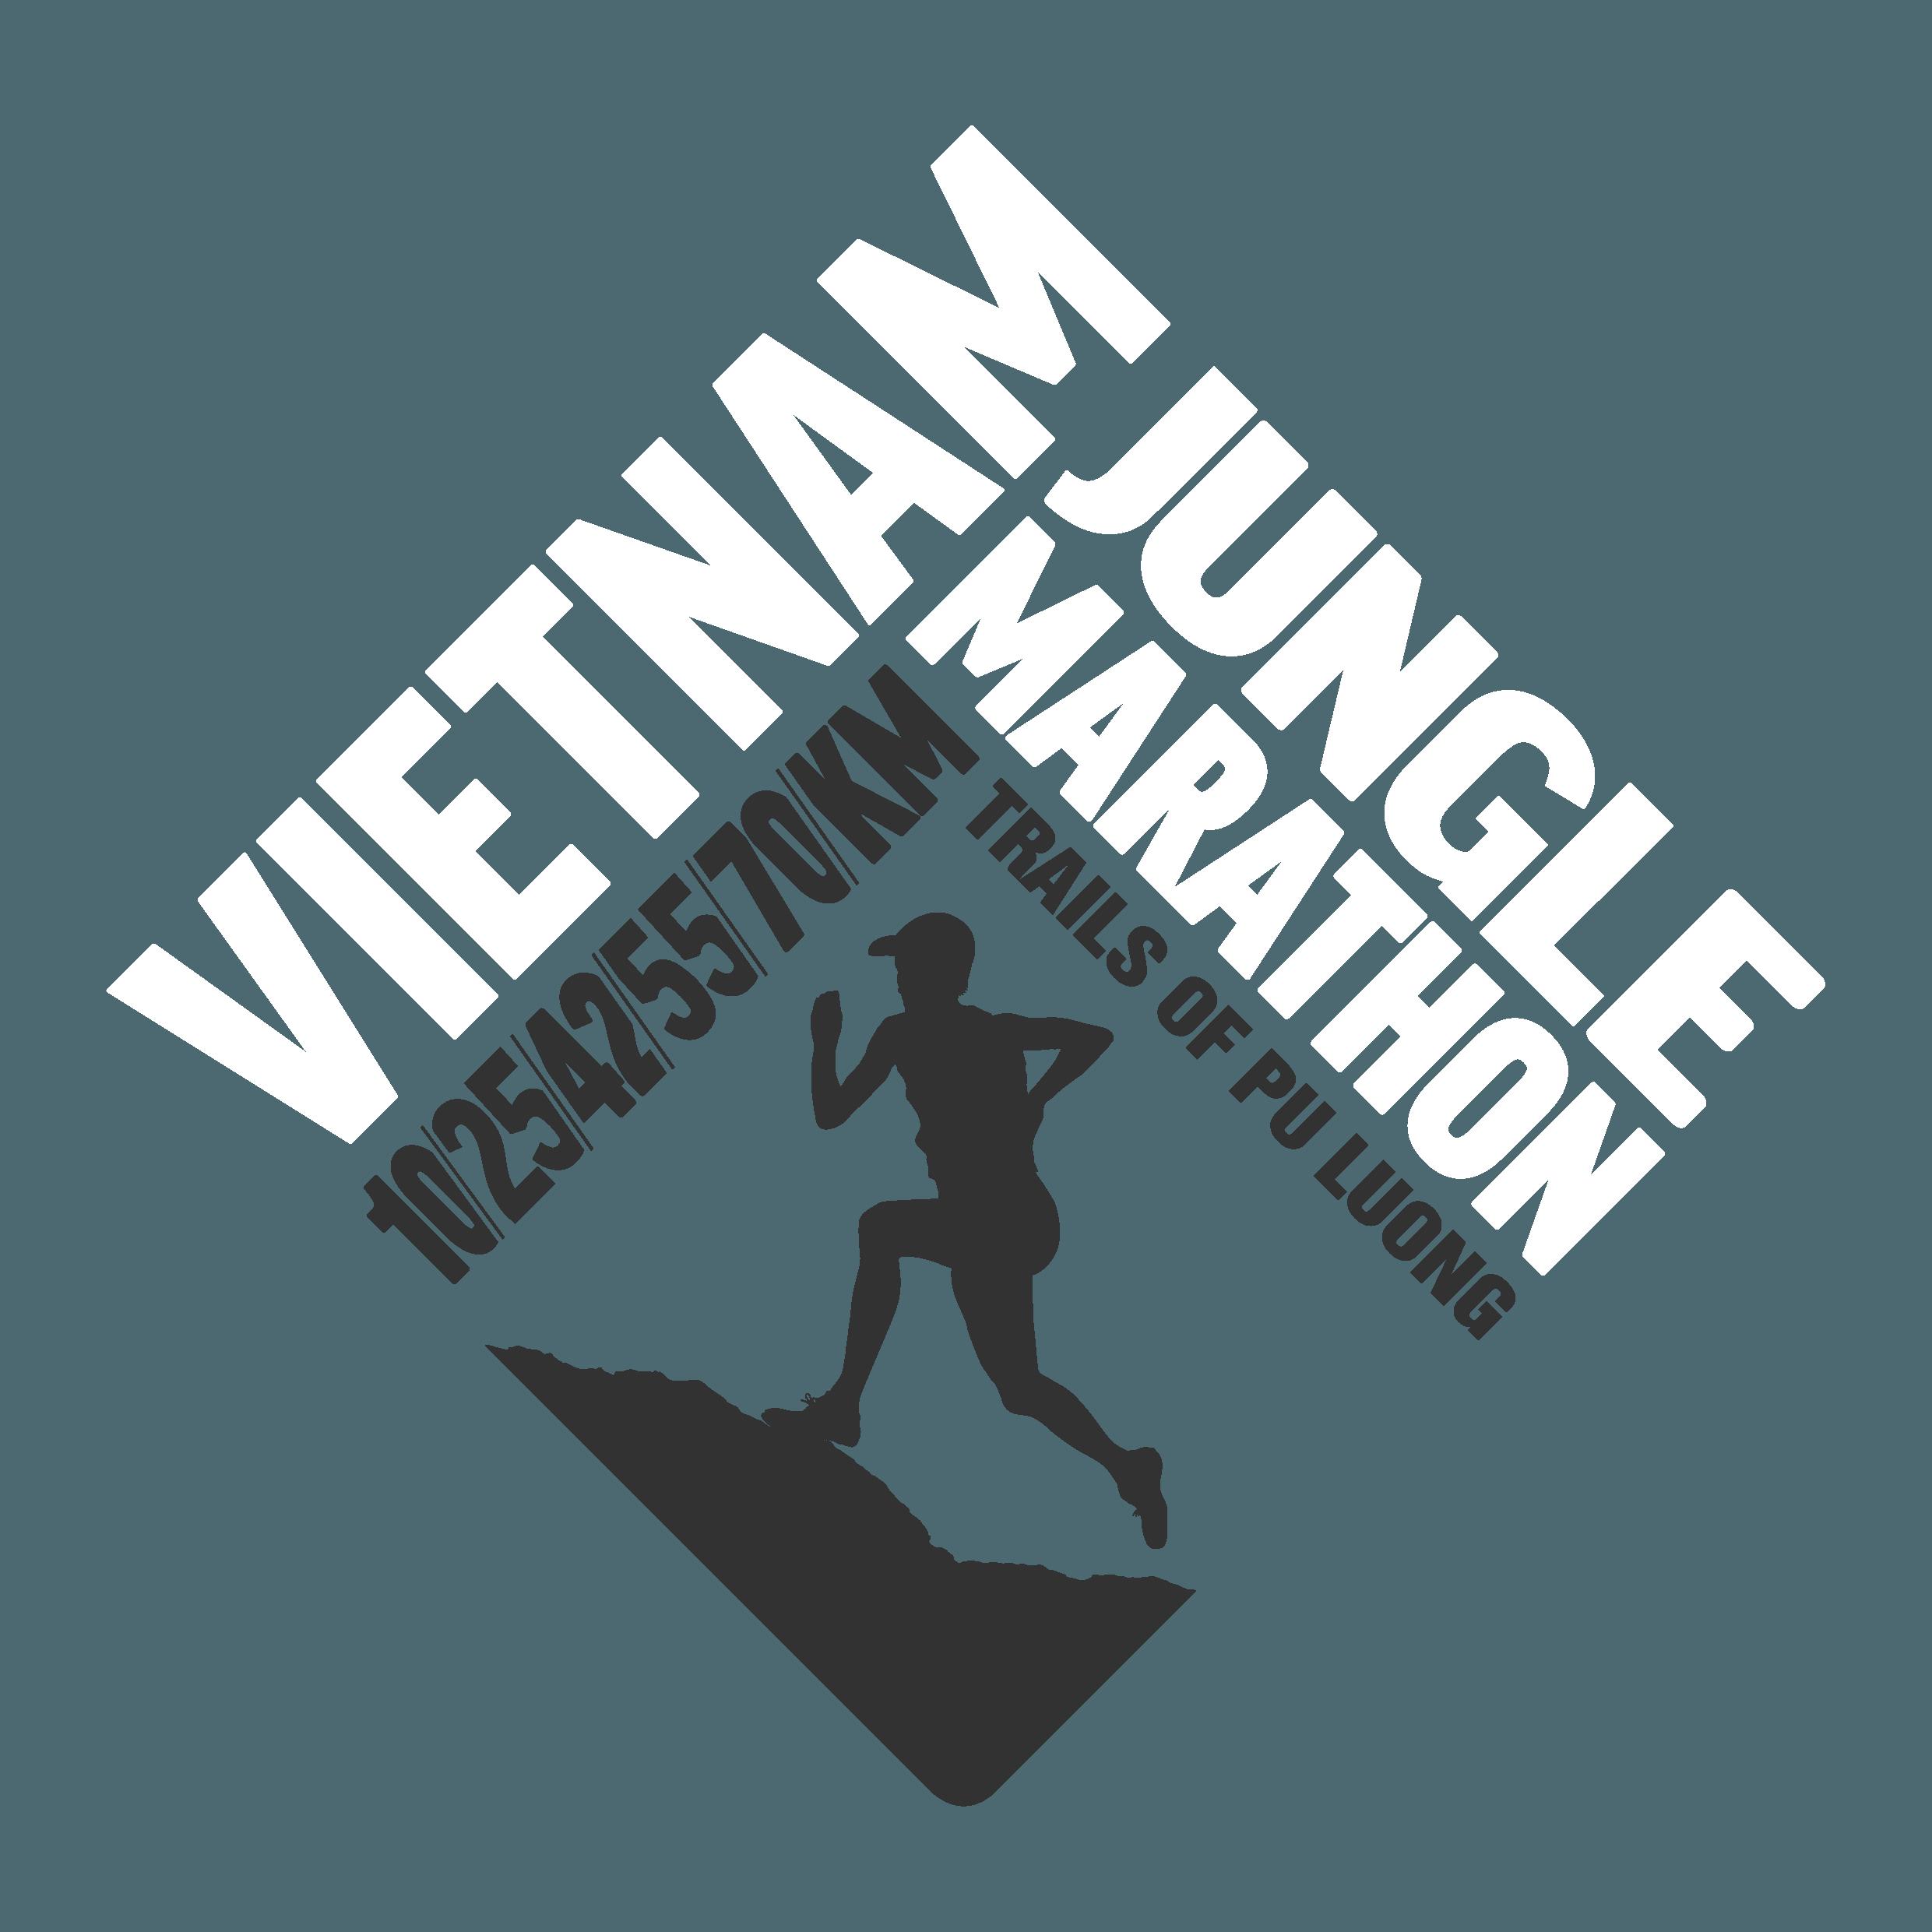 Logo VJM 2019 white (no year)